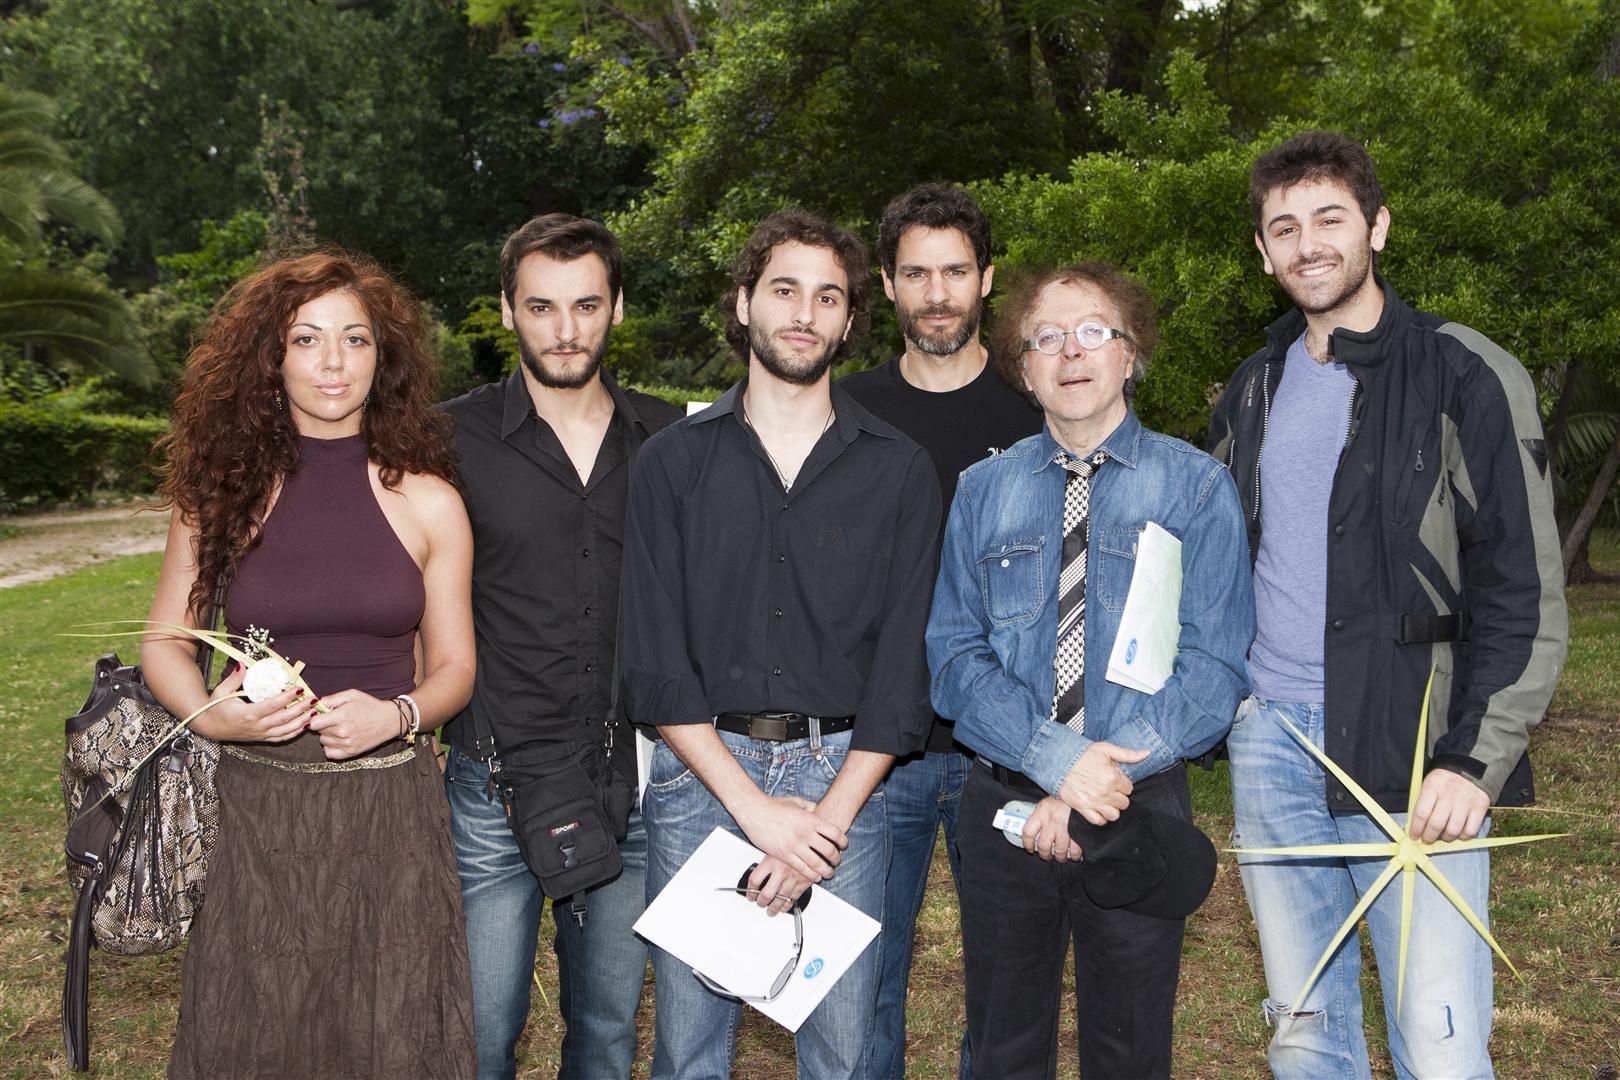 telemaque-moudatsakis-and-actors-team